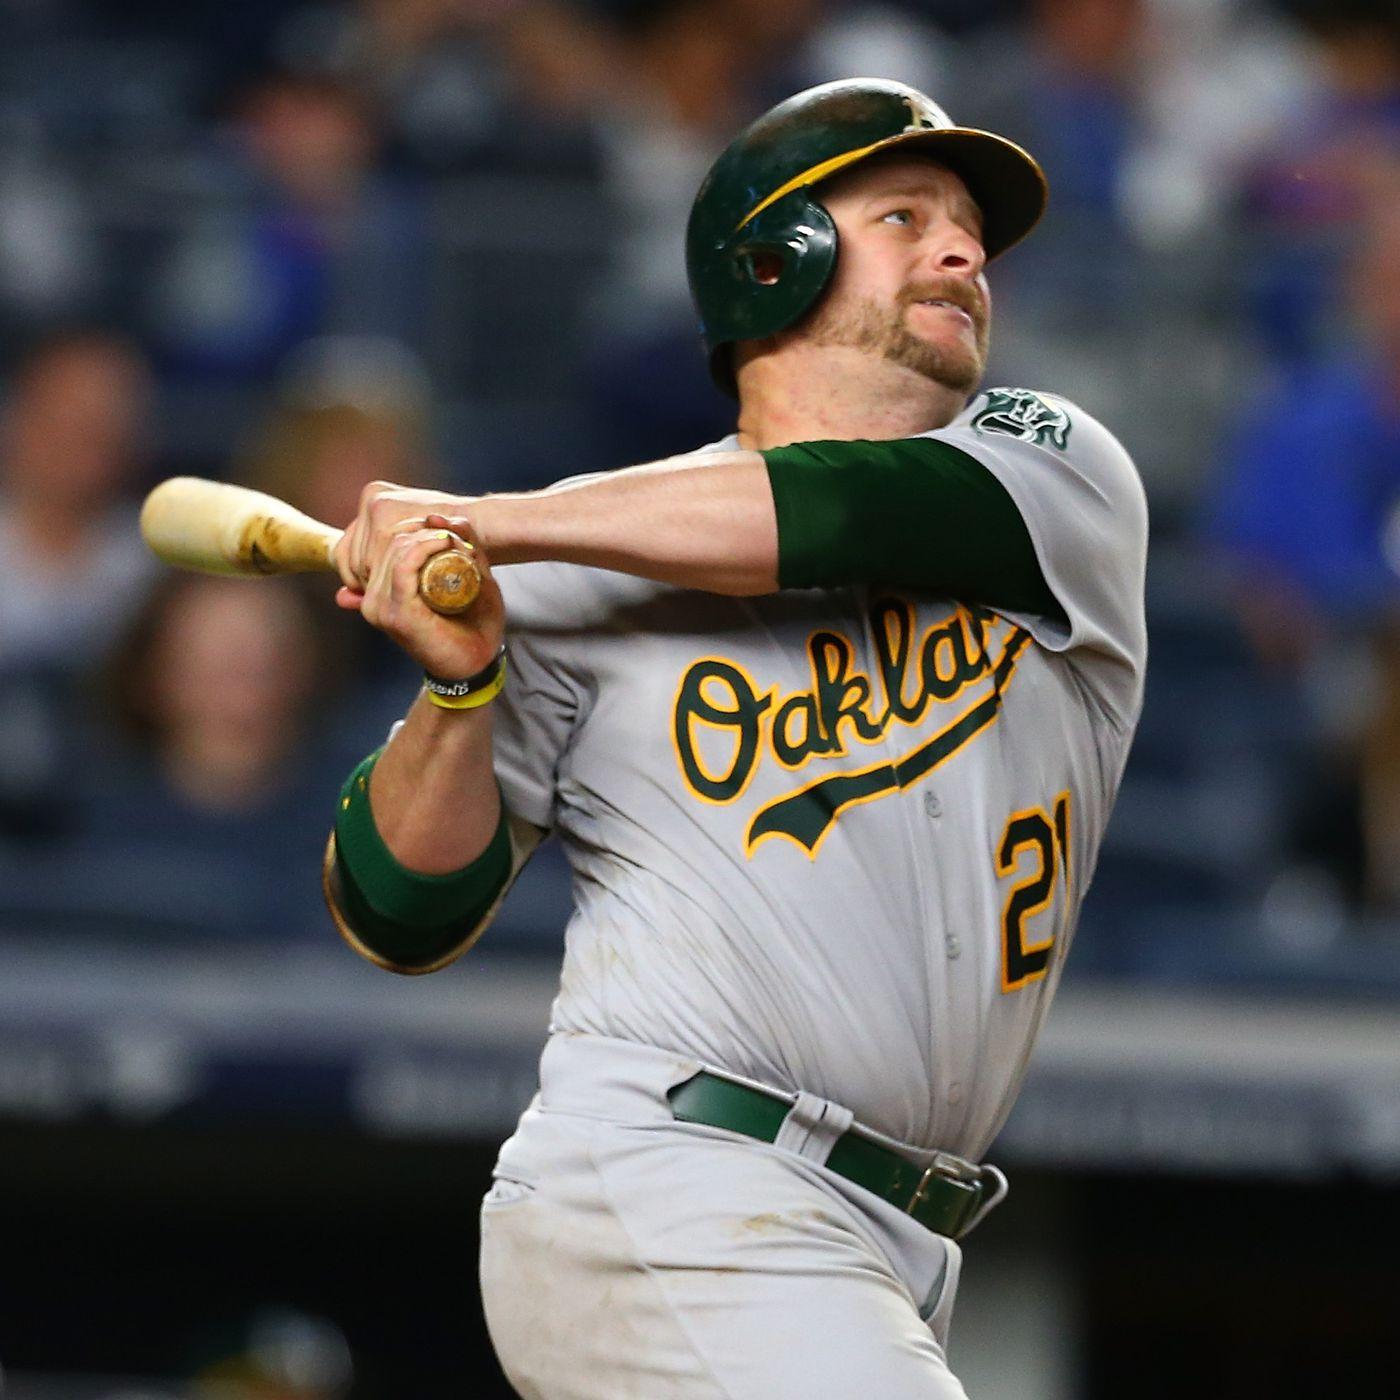 Steven Vogt - My Life as a Major League Baseball player